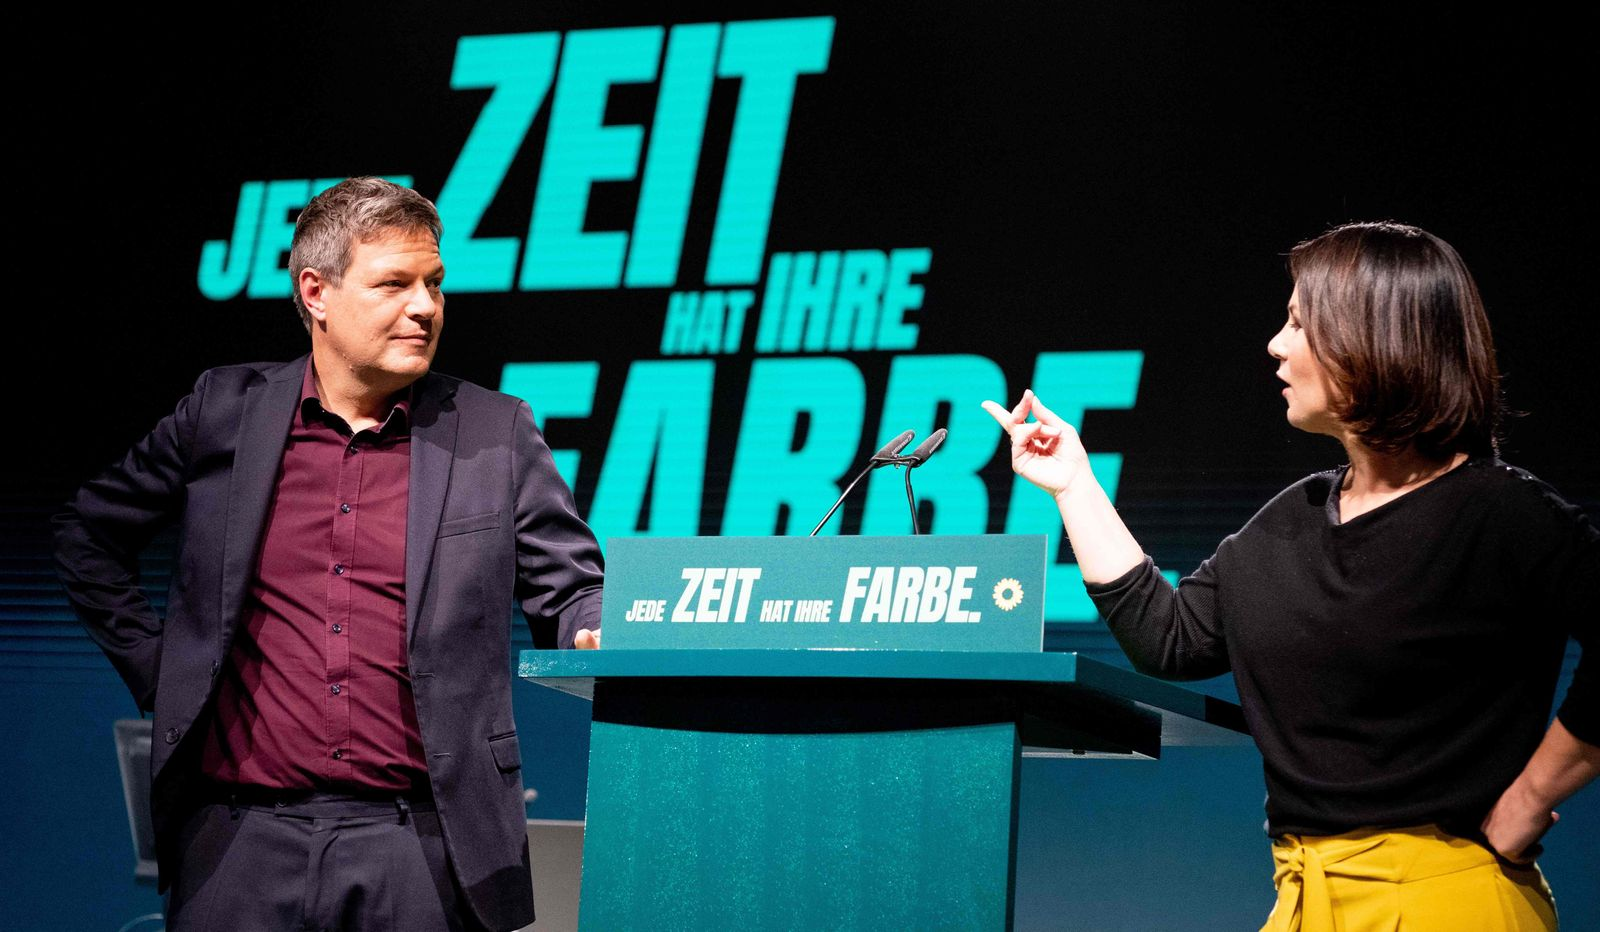 GERMANY-POLITICS-PARTIES-CONGRESS